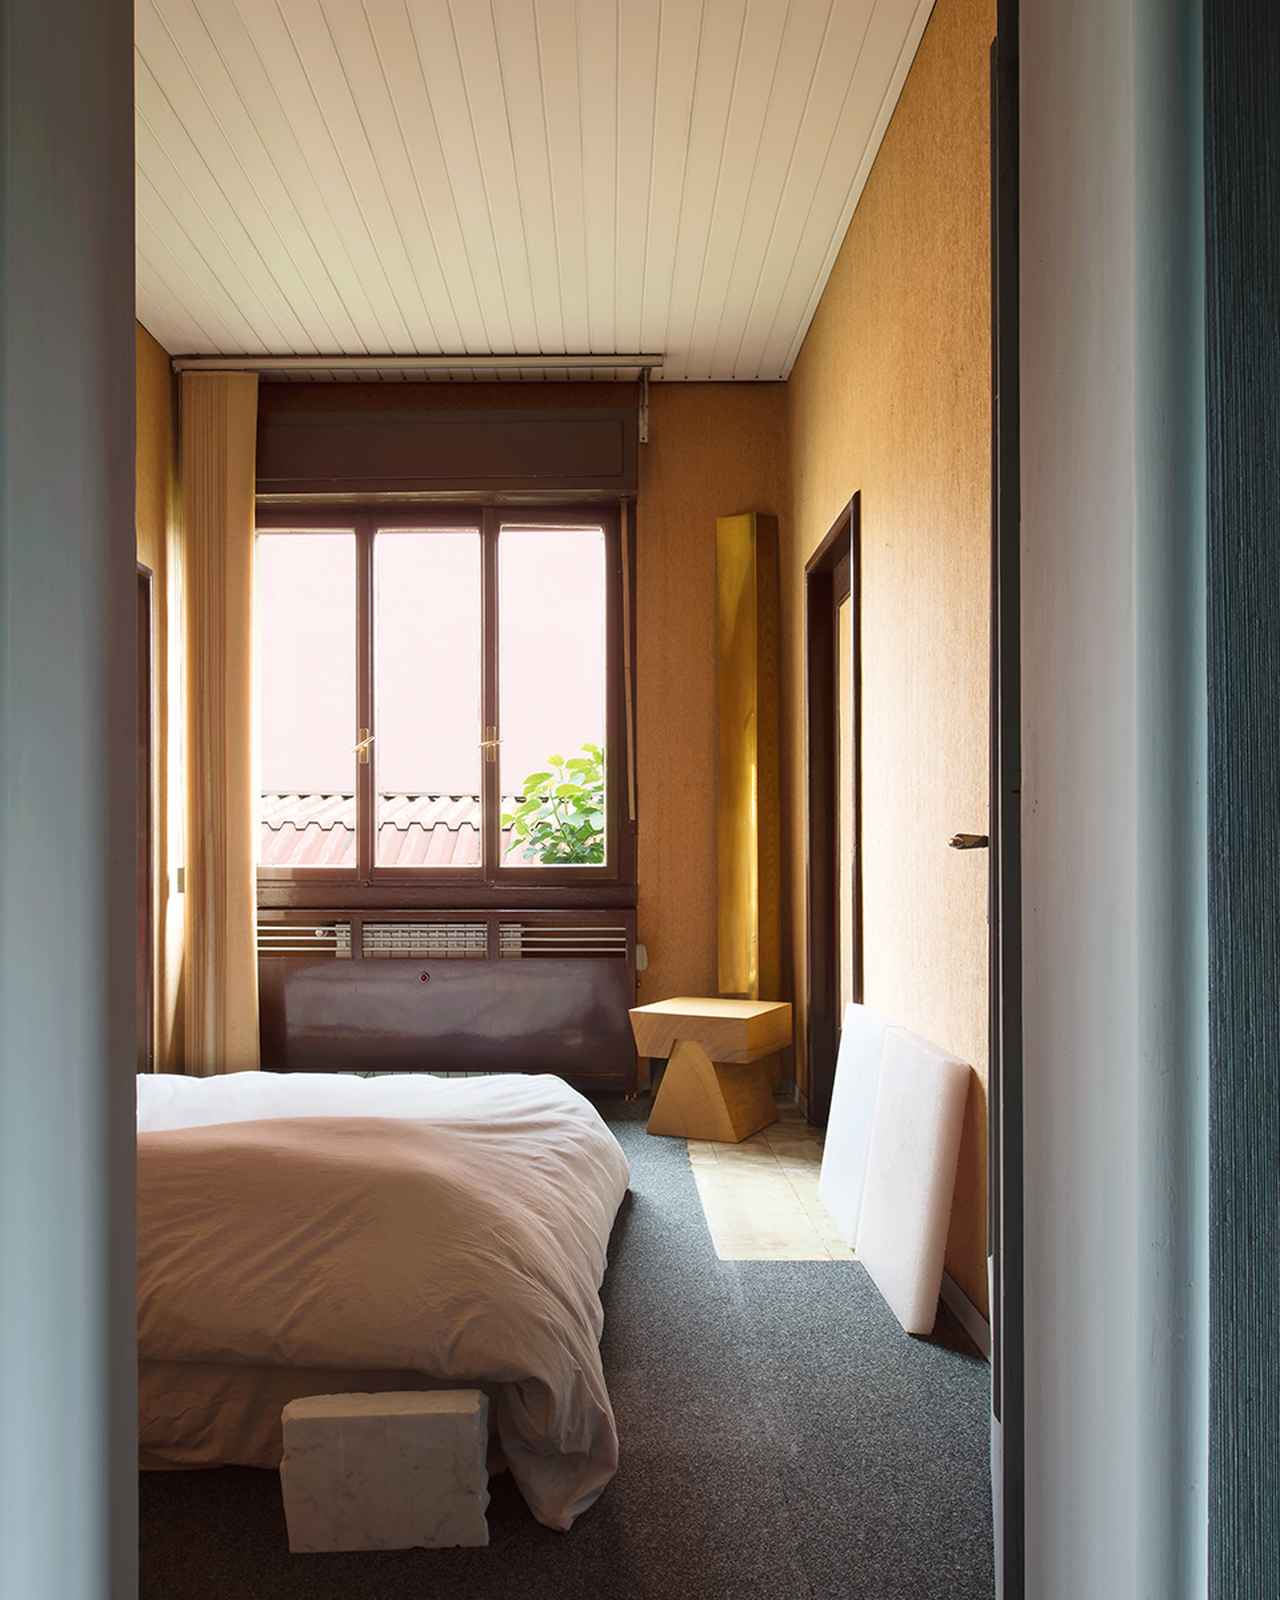 Images : 6番目の画像 - 「建築家トニョンが試みる 実験的な住まいのかたち」のアルバム - T JAPAN:The New York Times Style Magazine 公式サイト